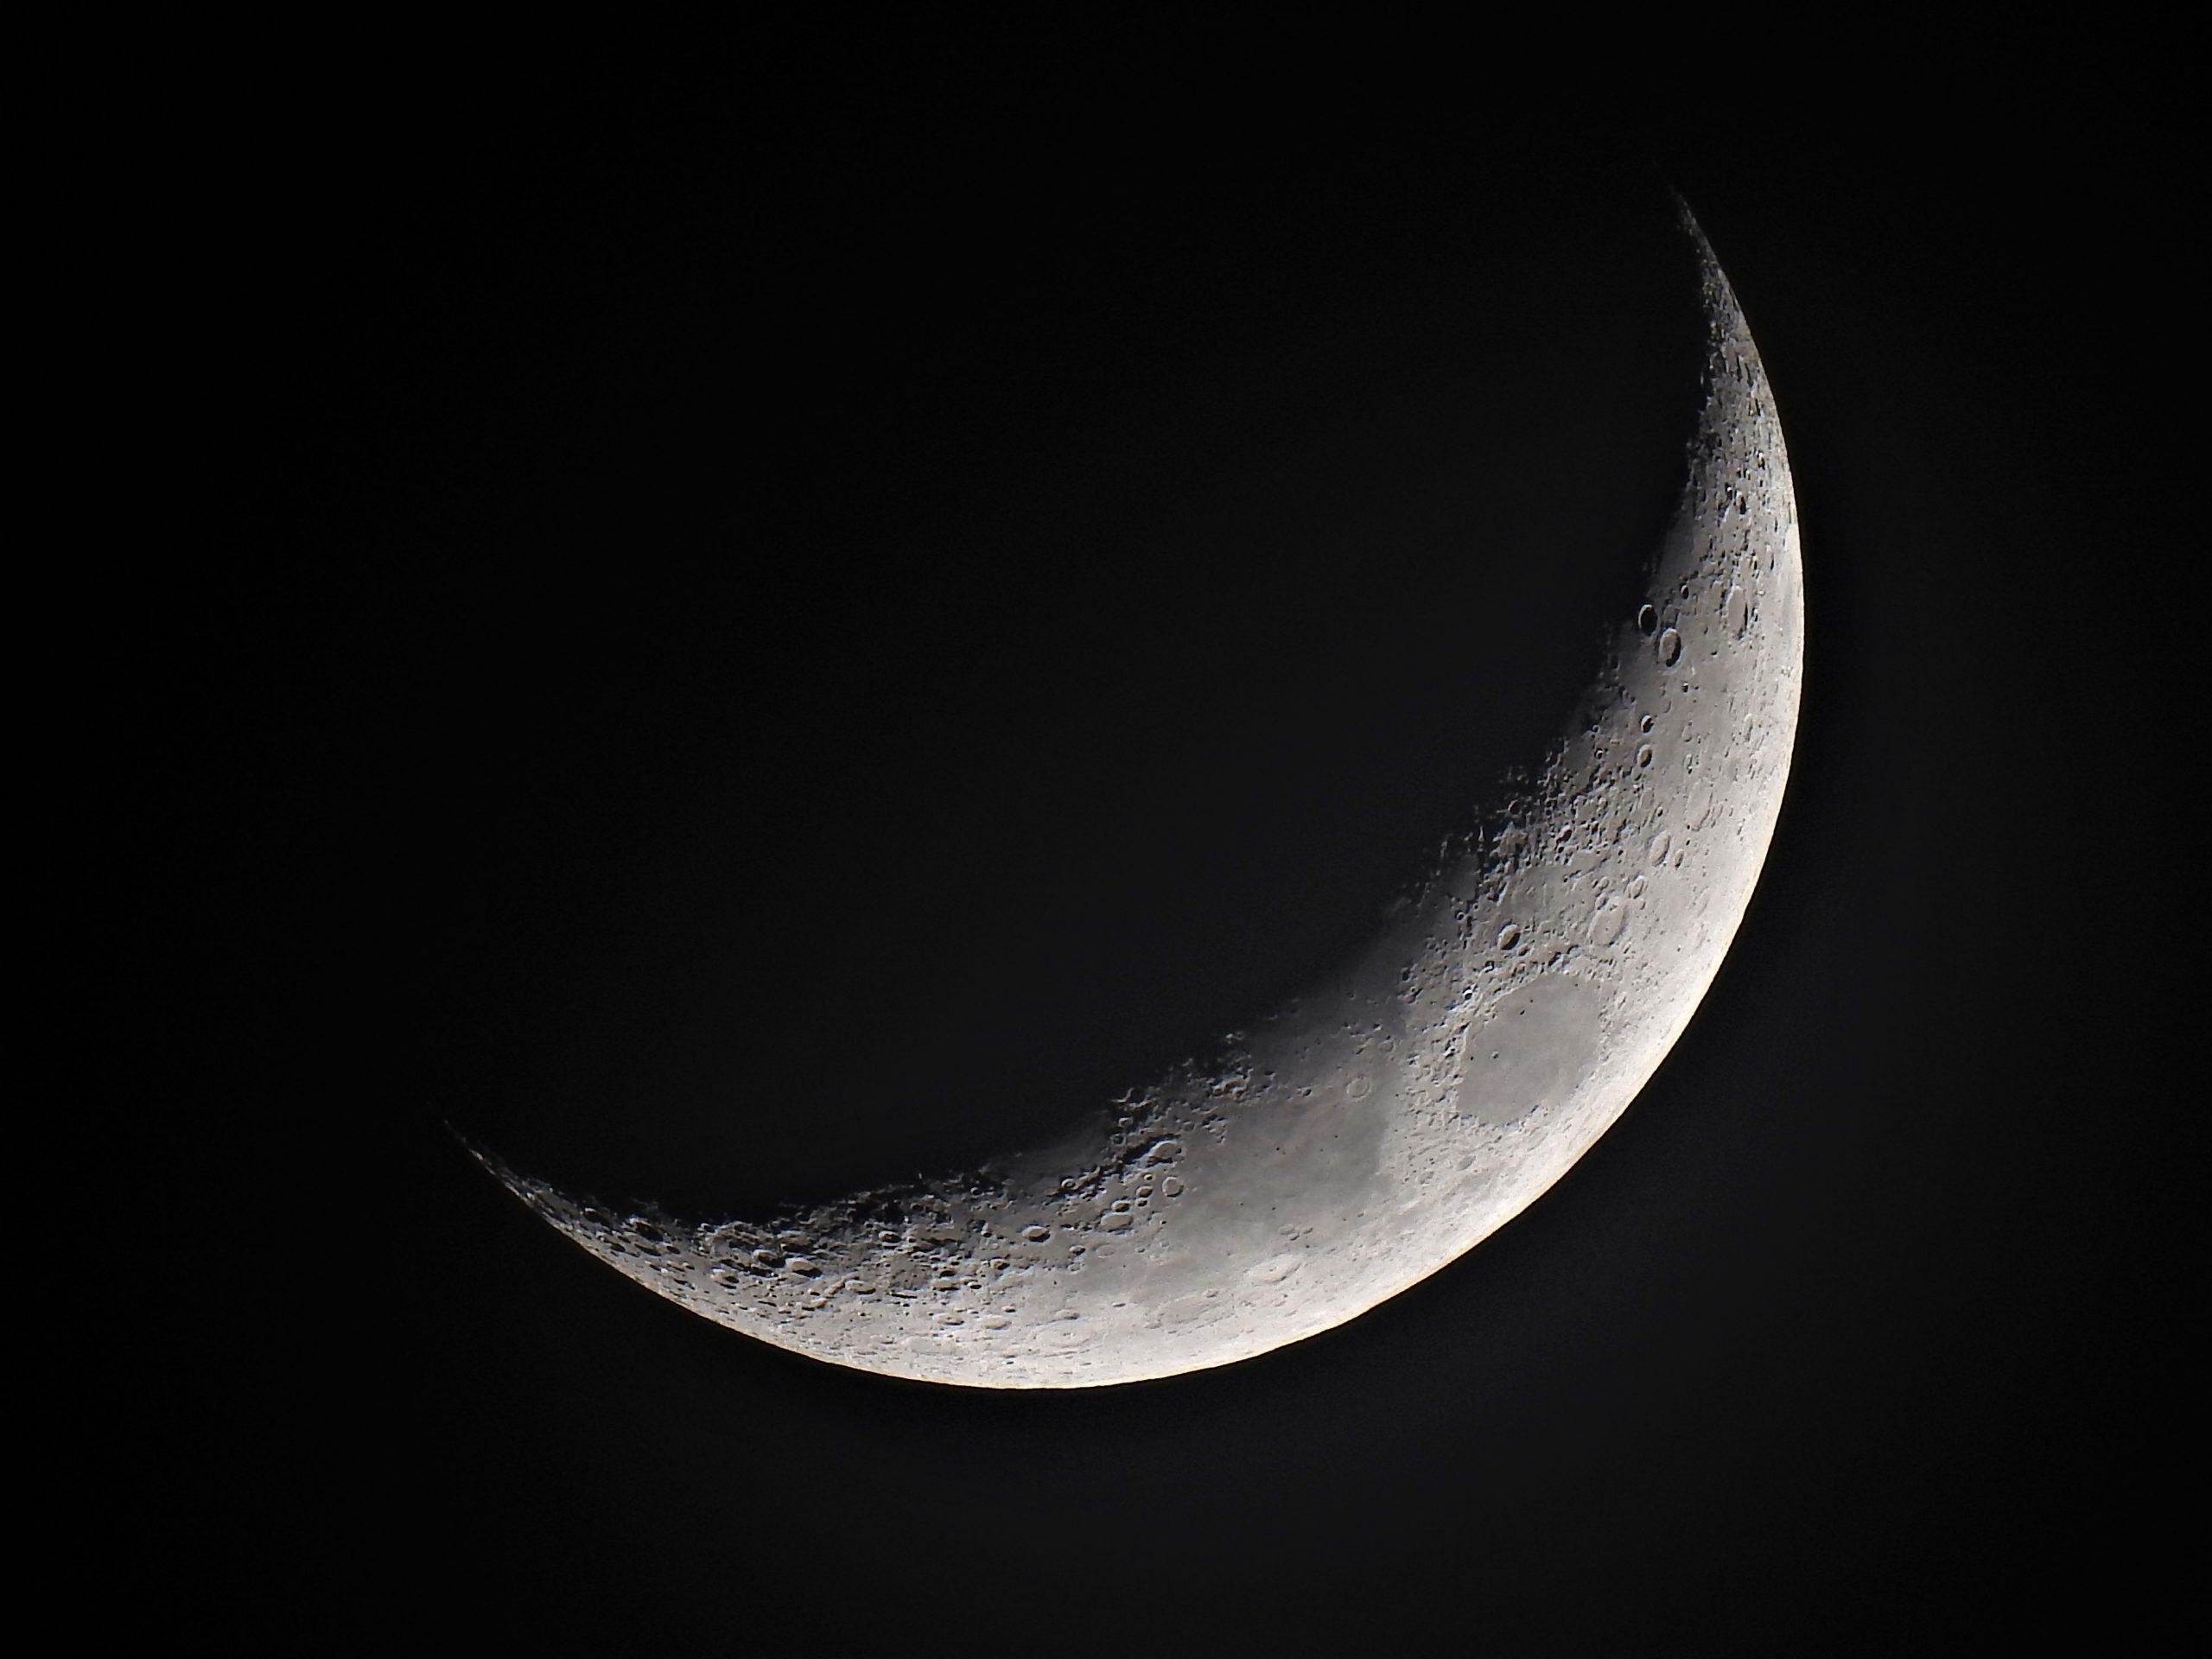 La Luna Hoy 29/01/2020